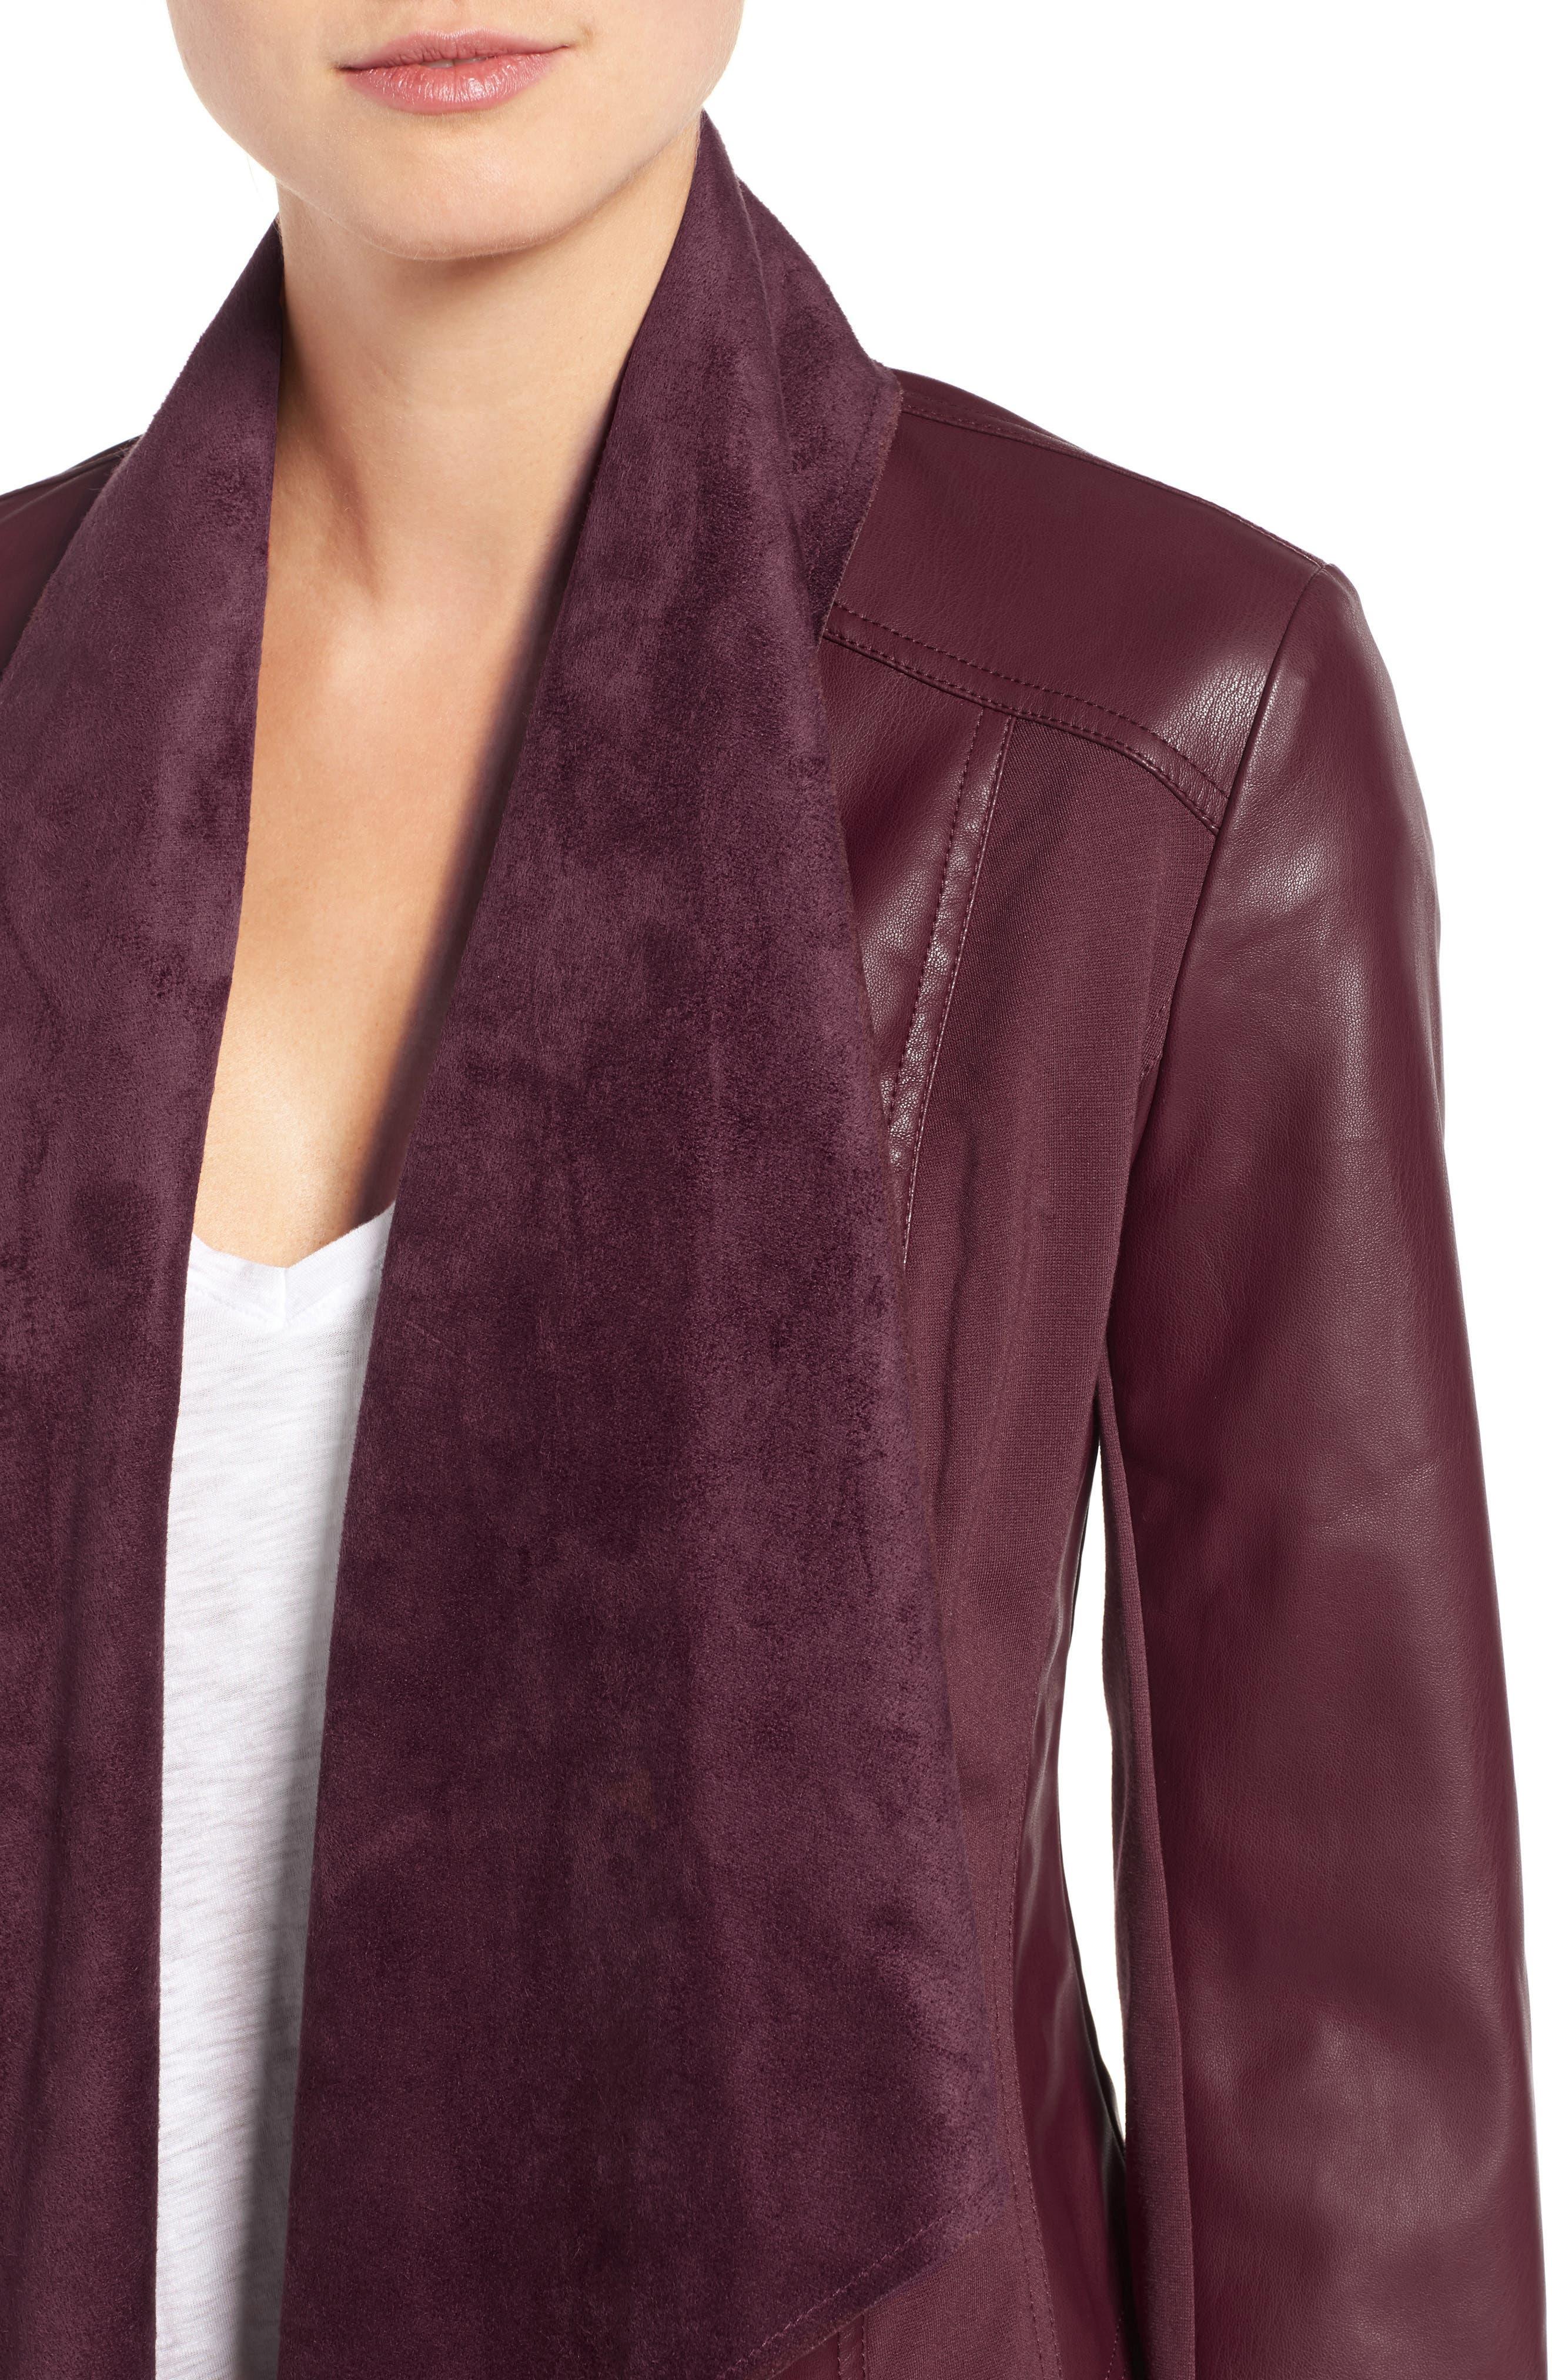 'Ana' Faux Leather Drape Front Jacket,                             Alternate thumbnail 8, color,